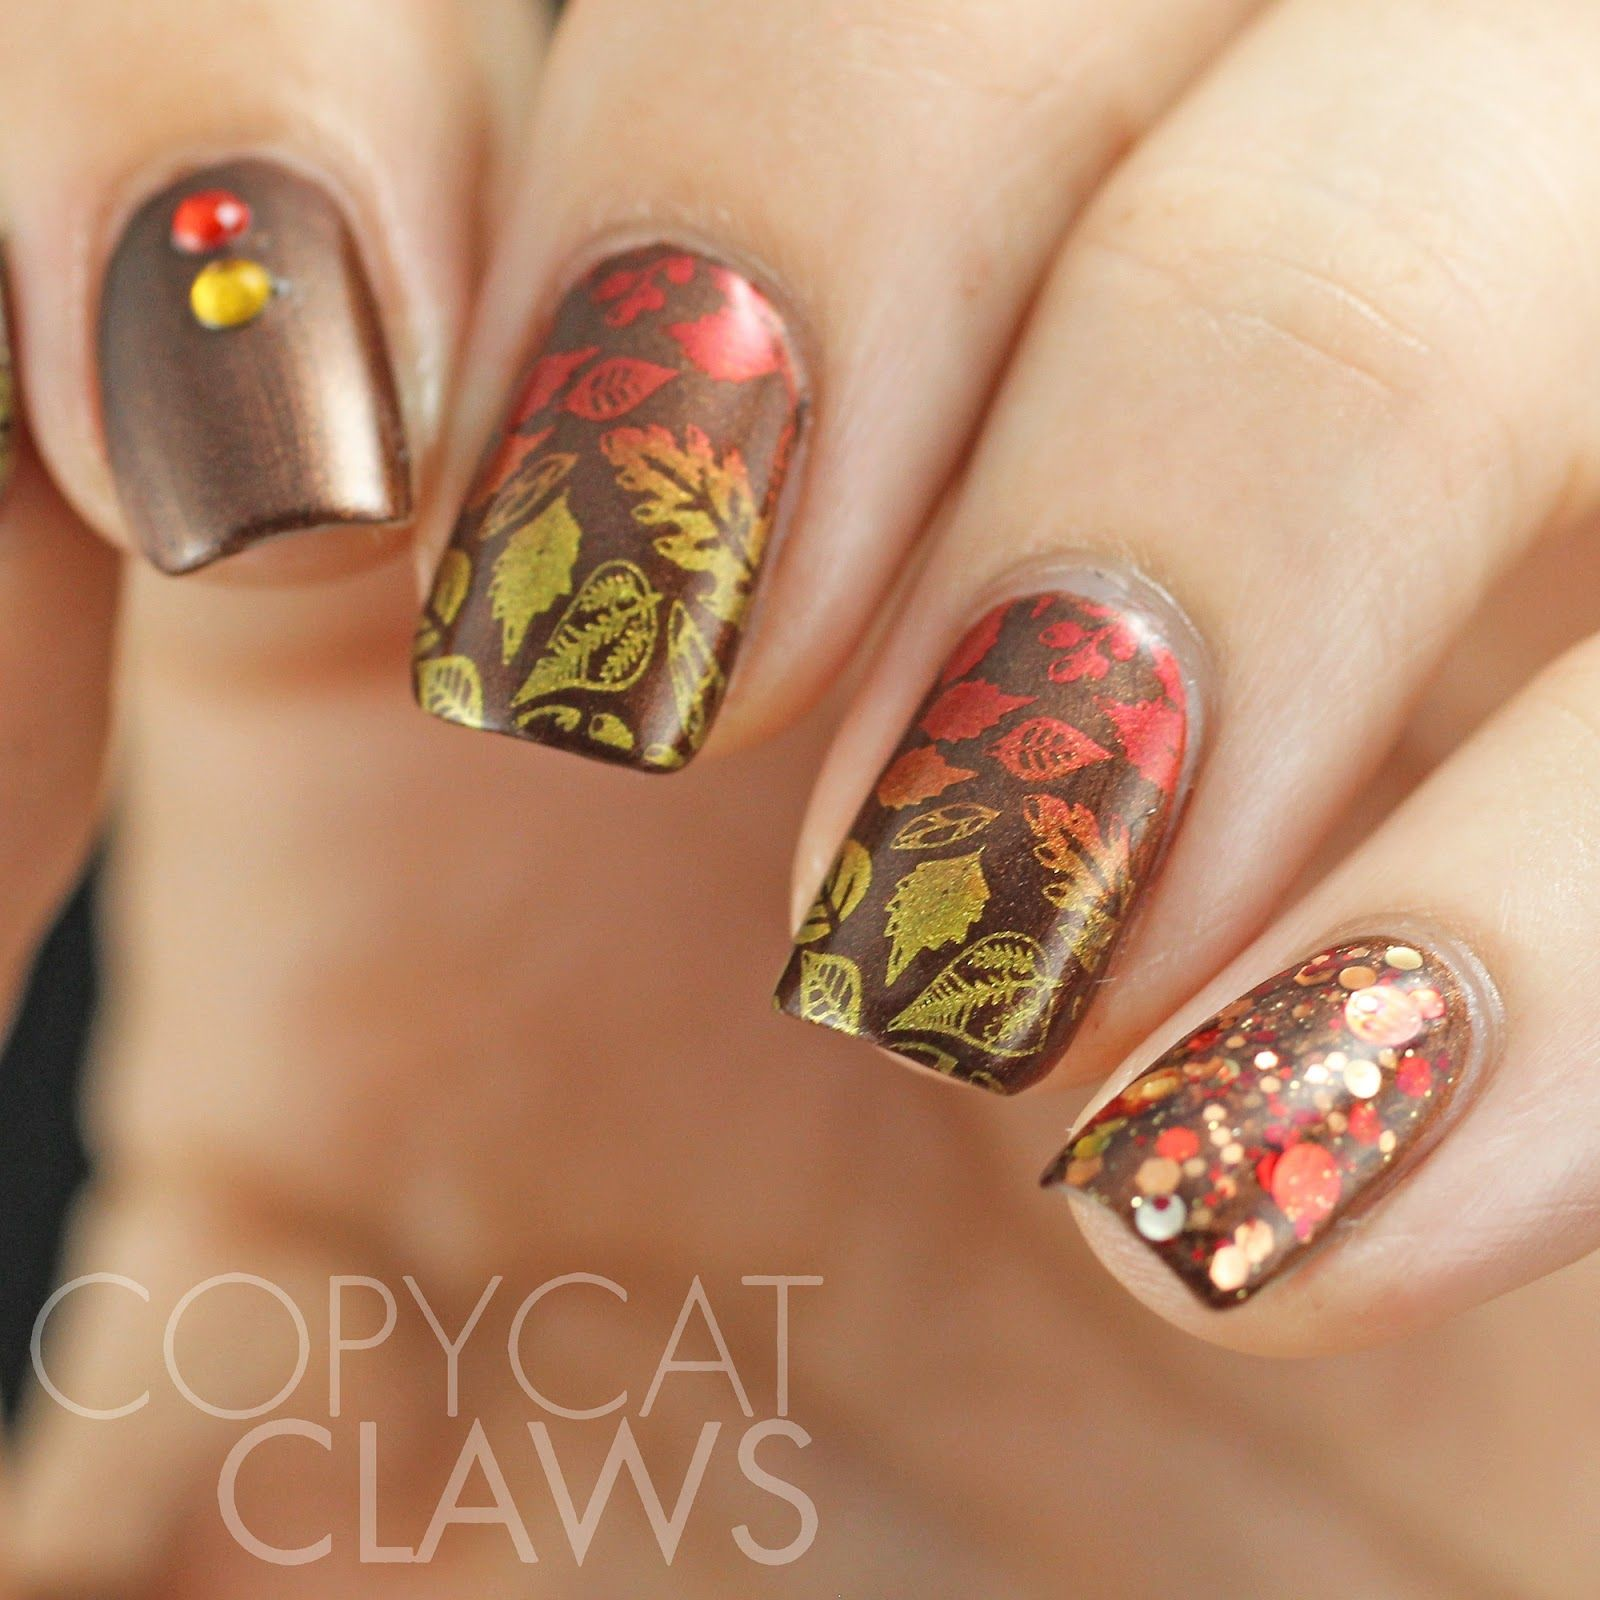 stamping uber chic - Recherche Google Nail art for all seasons! Nail ...